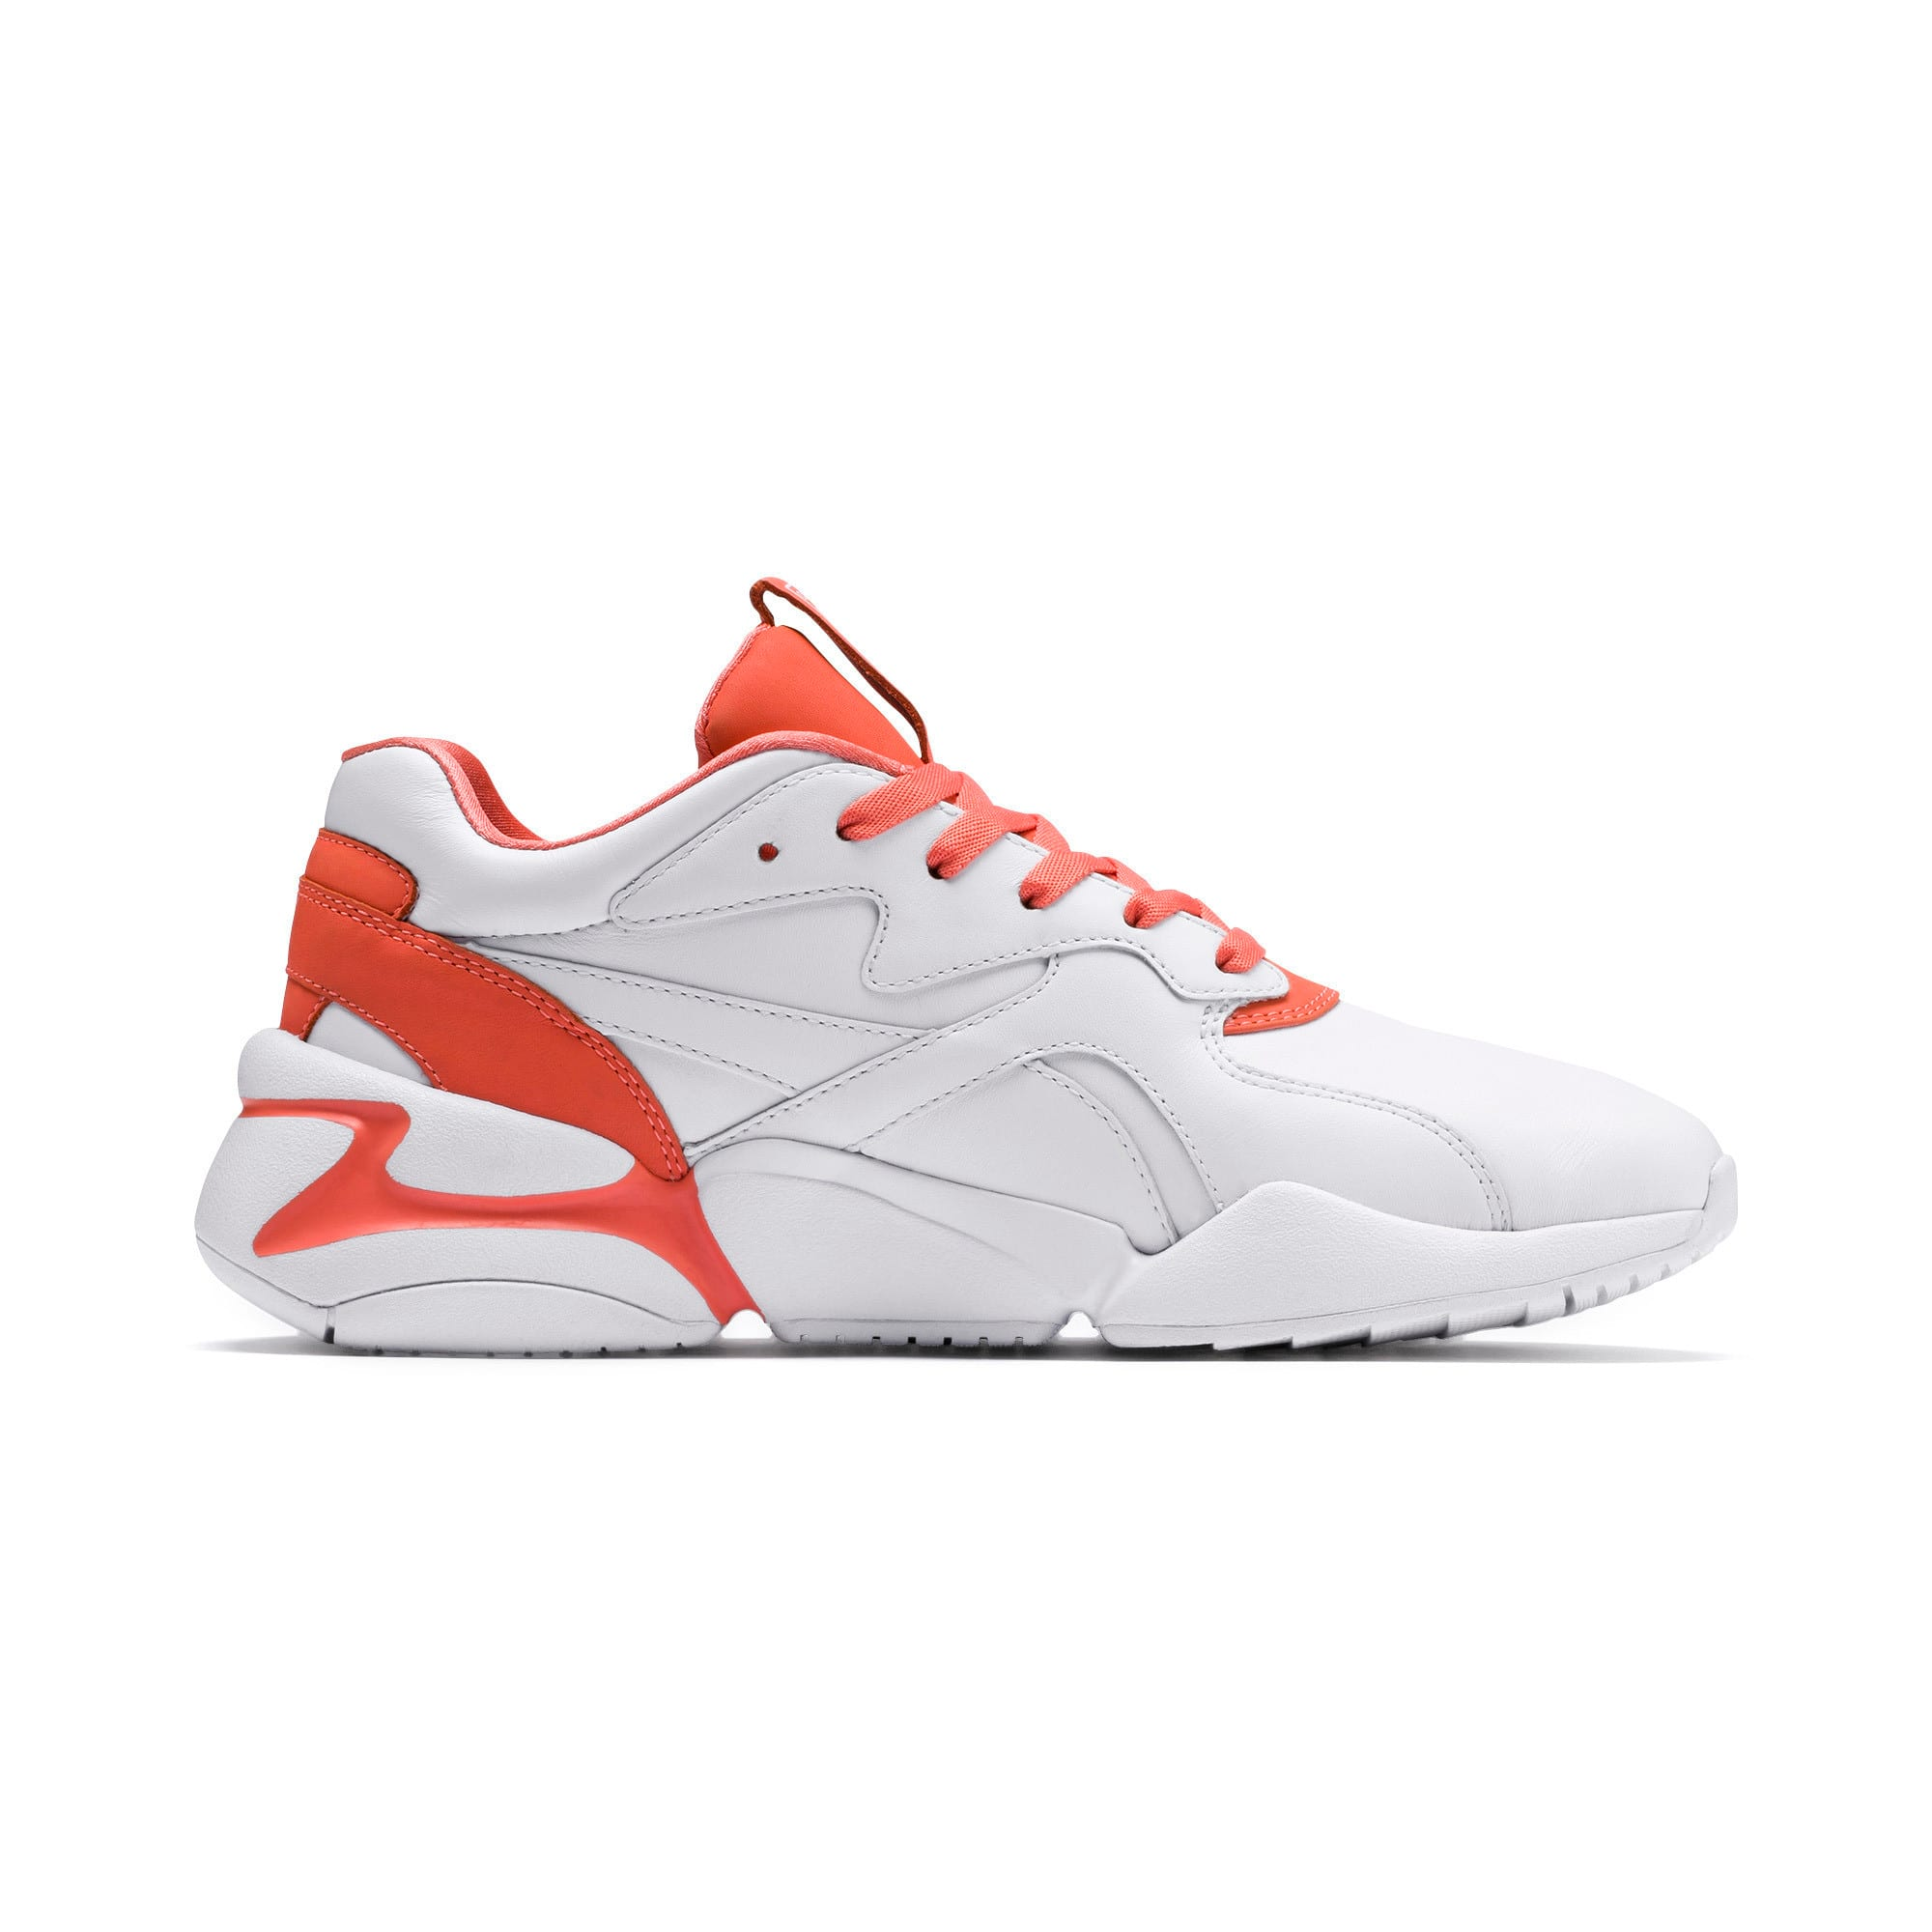 Thumbnail 5 of Nova x Pantone 2 Women's Sneakers, Puma White-Living Coral, medium